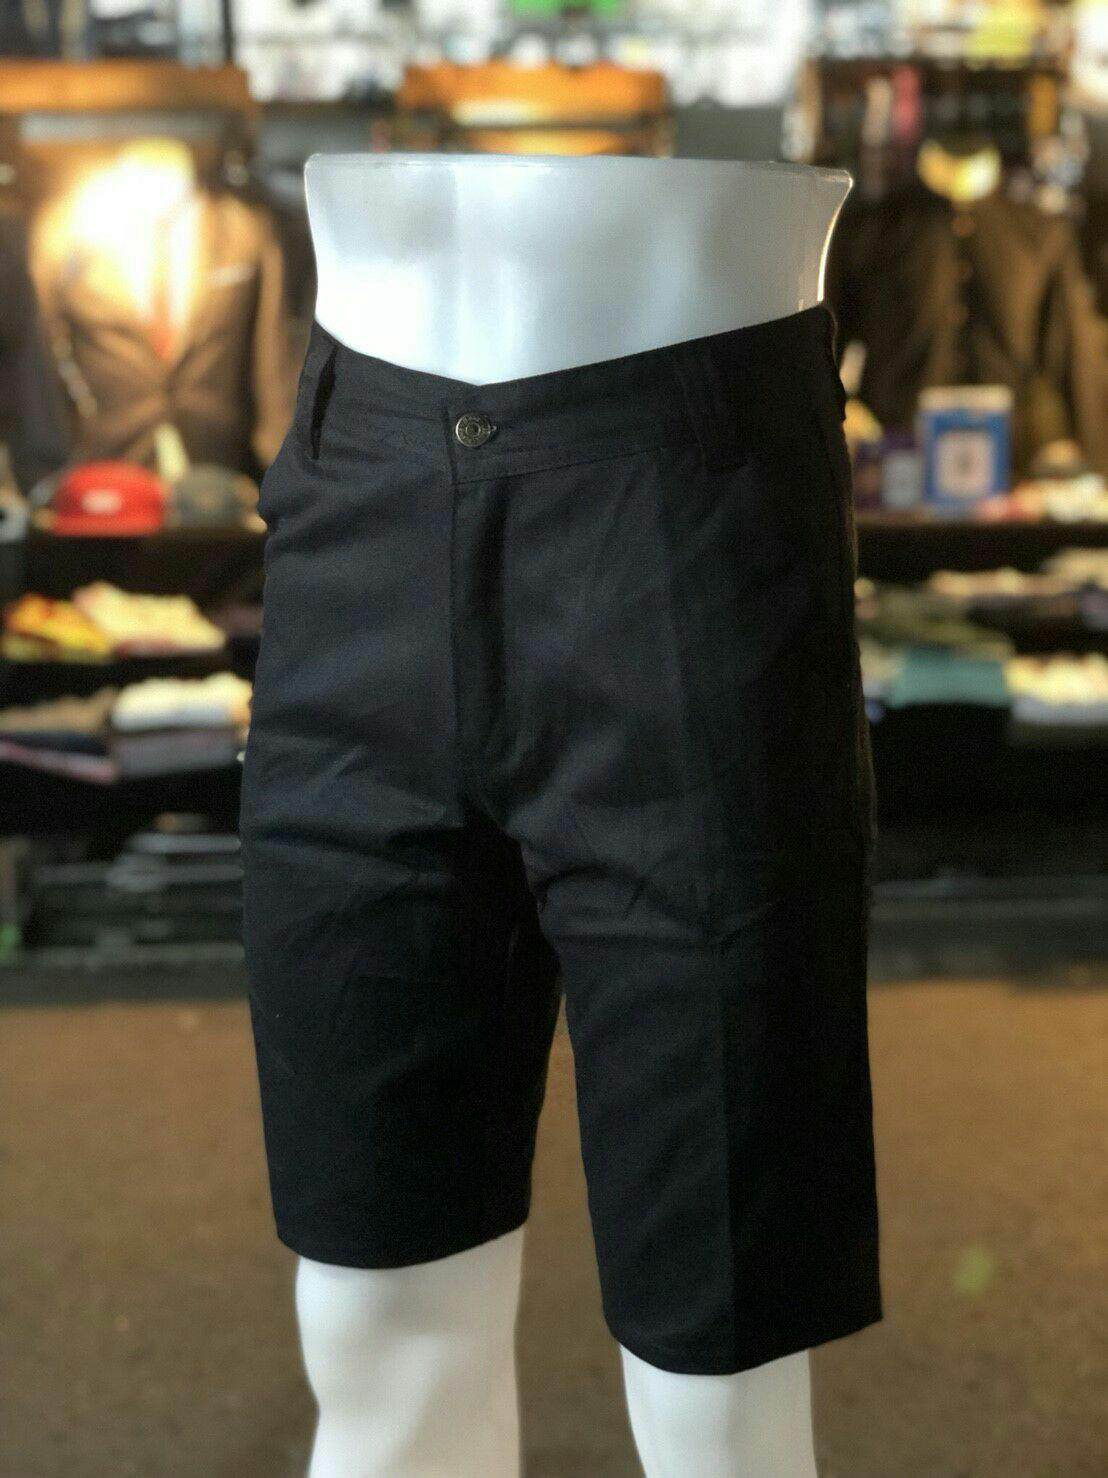 The Sj Shopกางเกงขาสั้นสามส่วน By The Sj Shop.